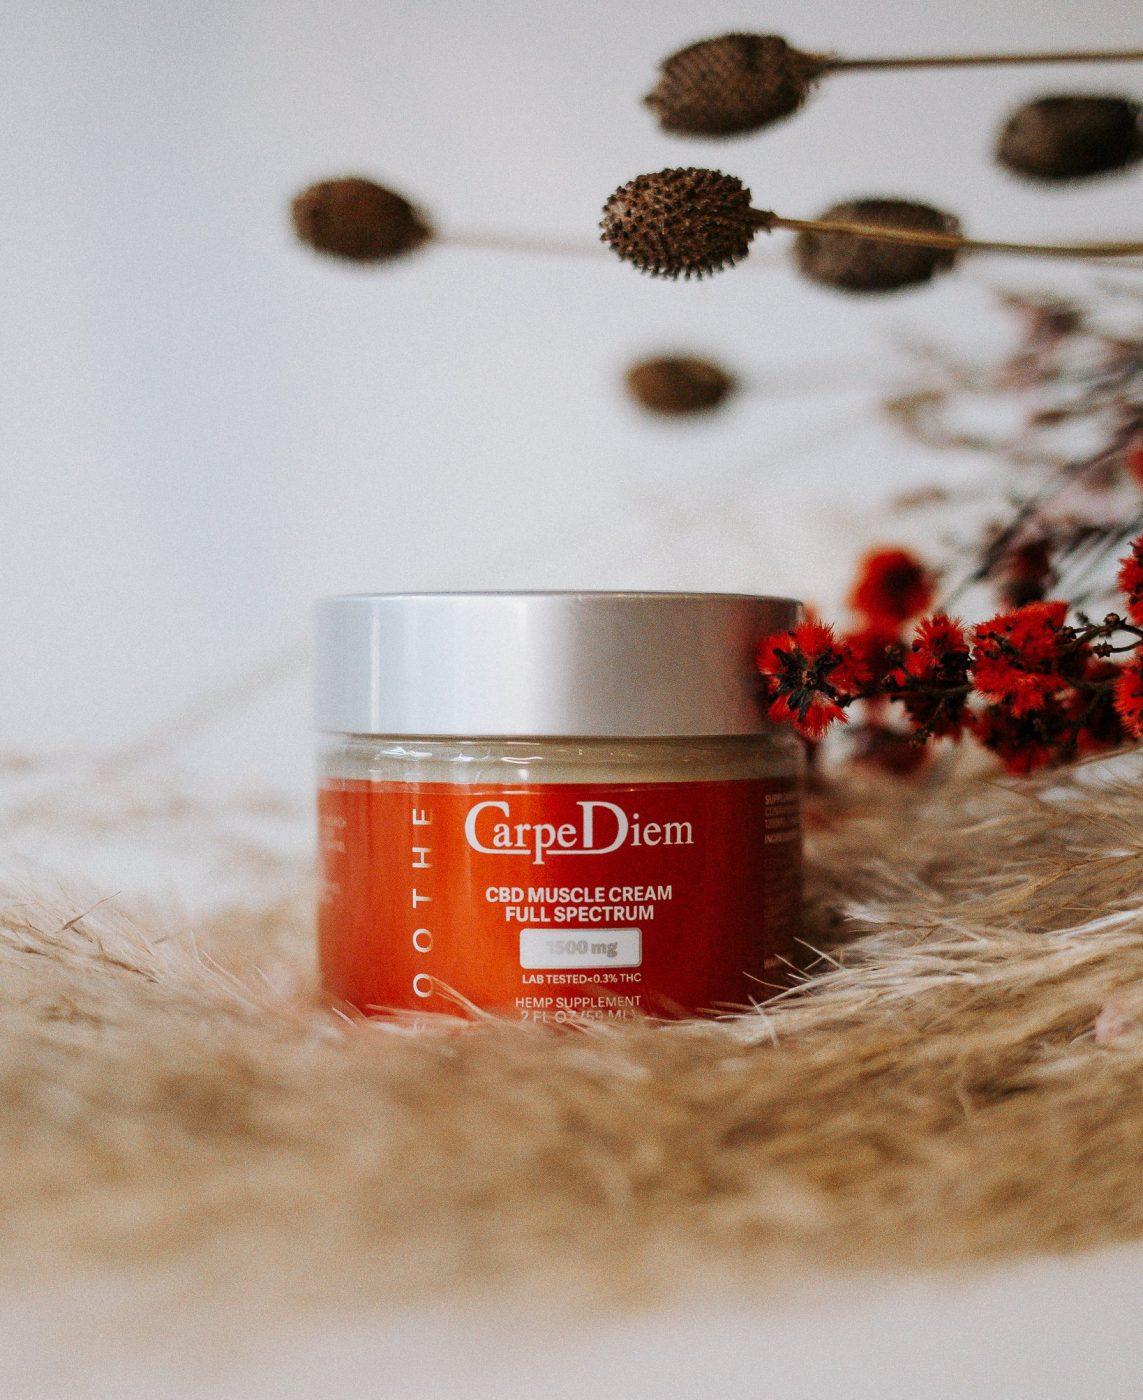 Carpe Diem brand CBD Muscle Cream 1500mg